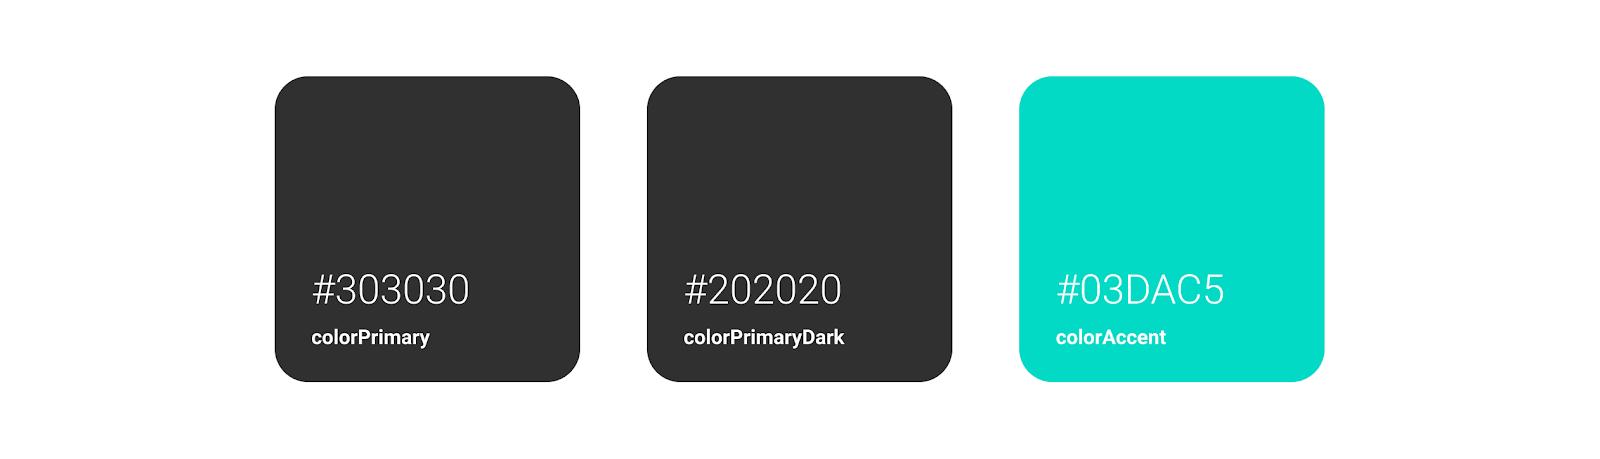 Dicoding Color schema